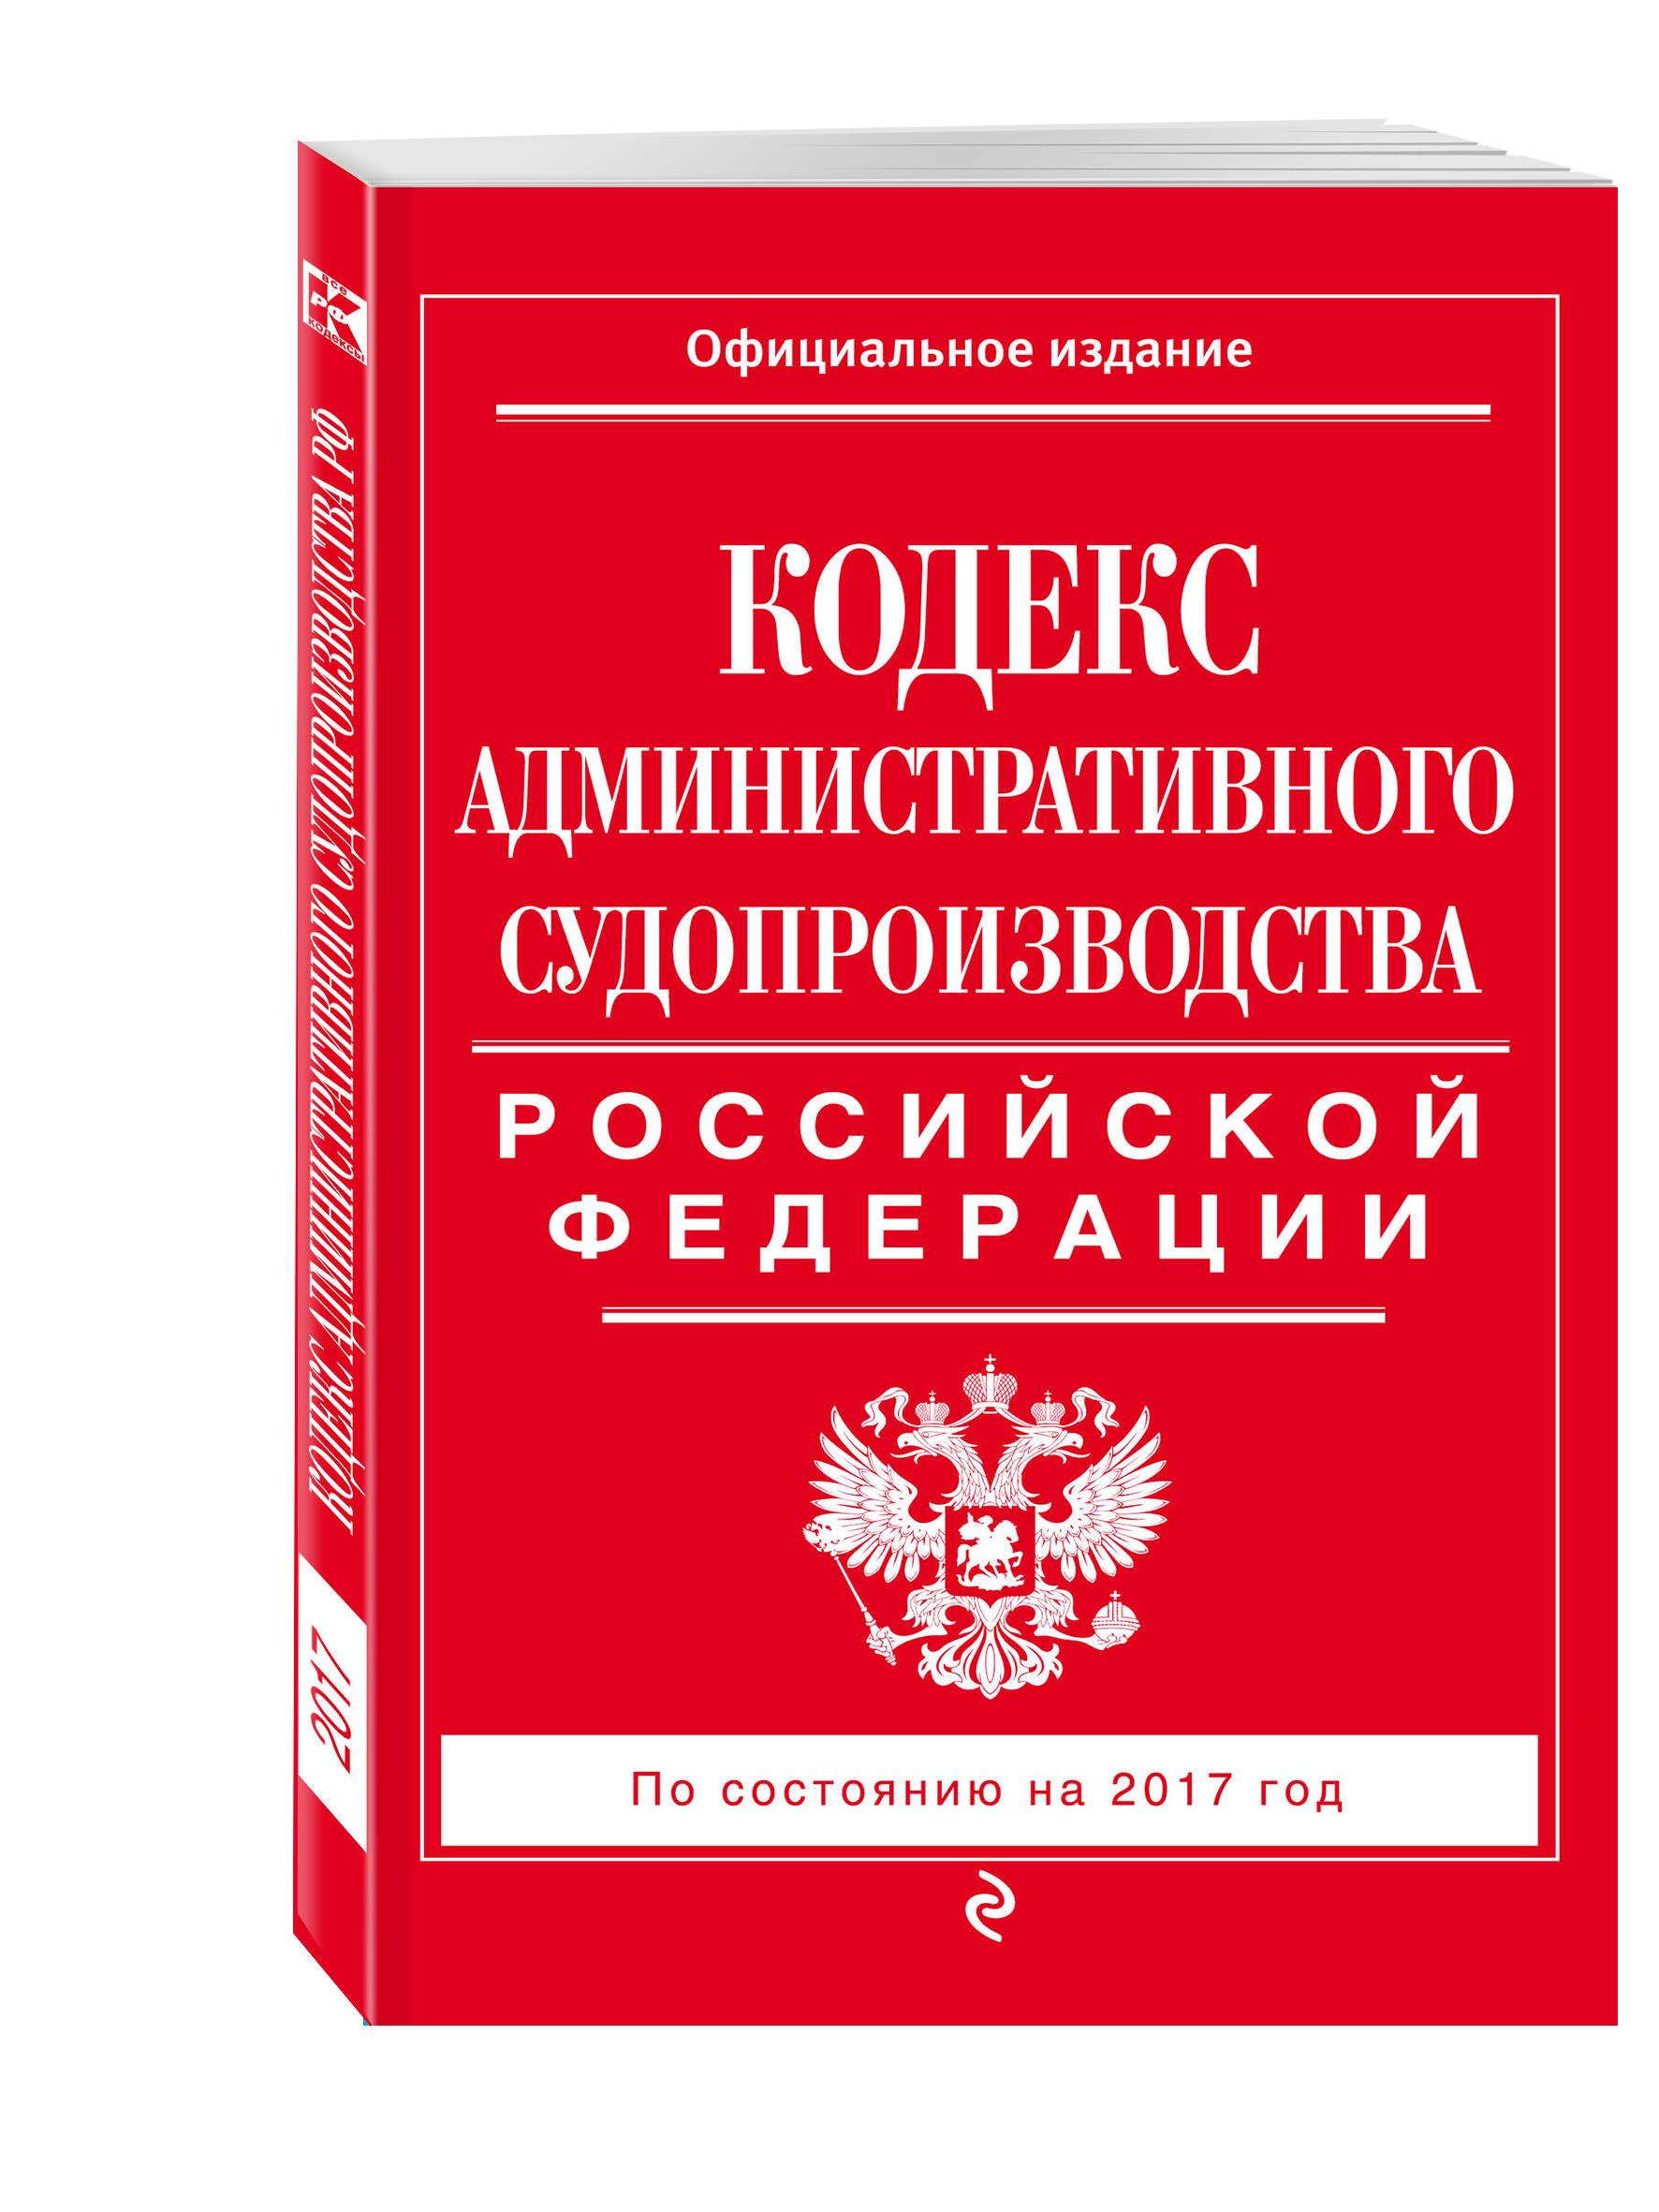 Кодекс административного судопроизводства РФ: по состоянию на 2017 год